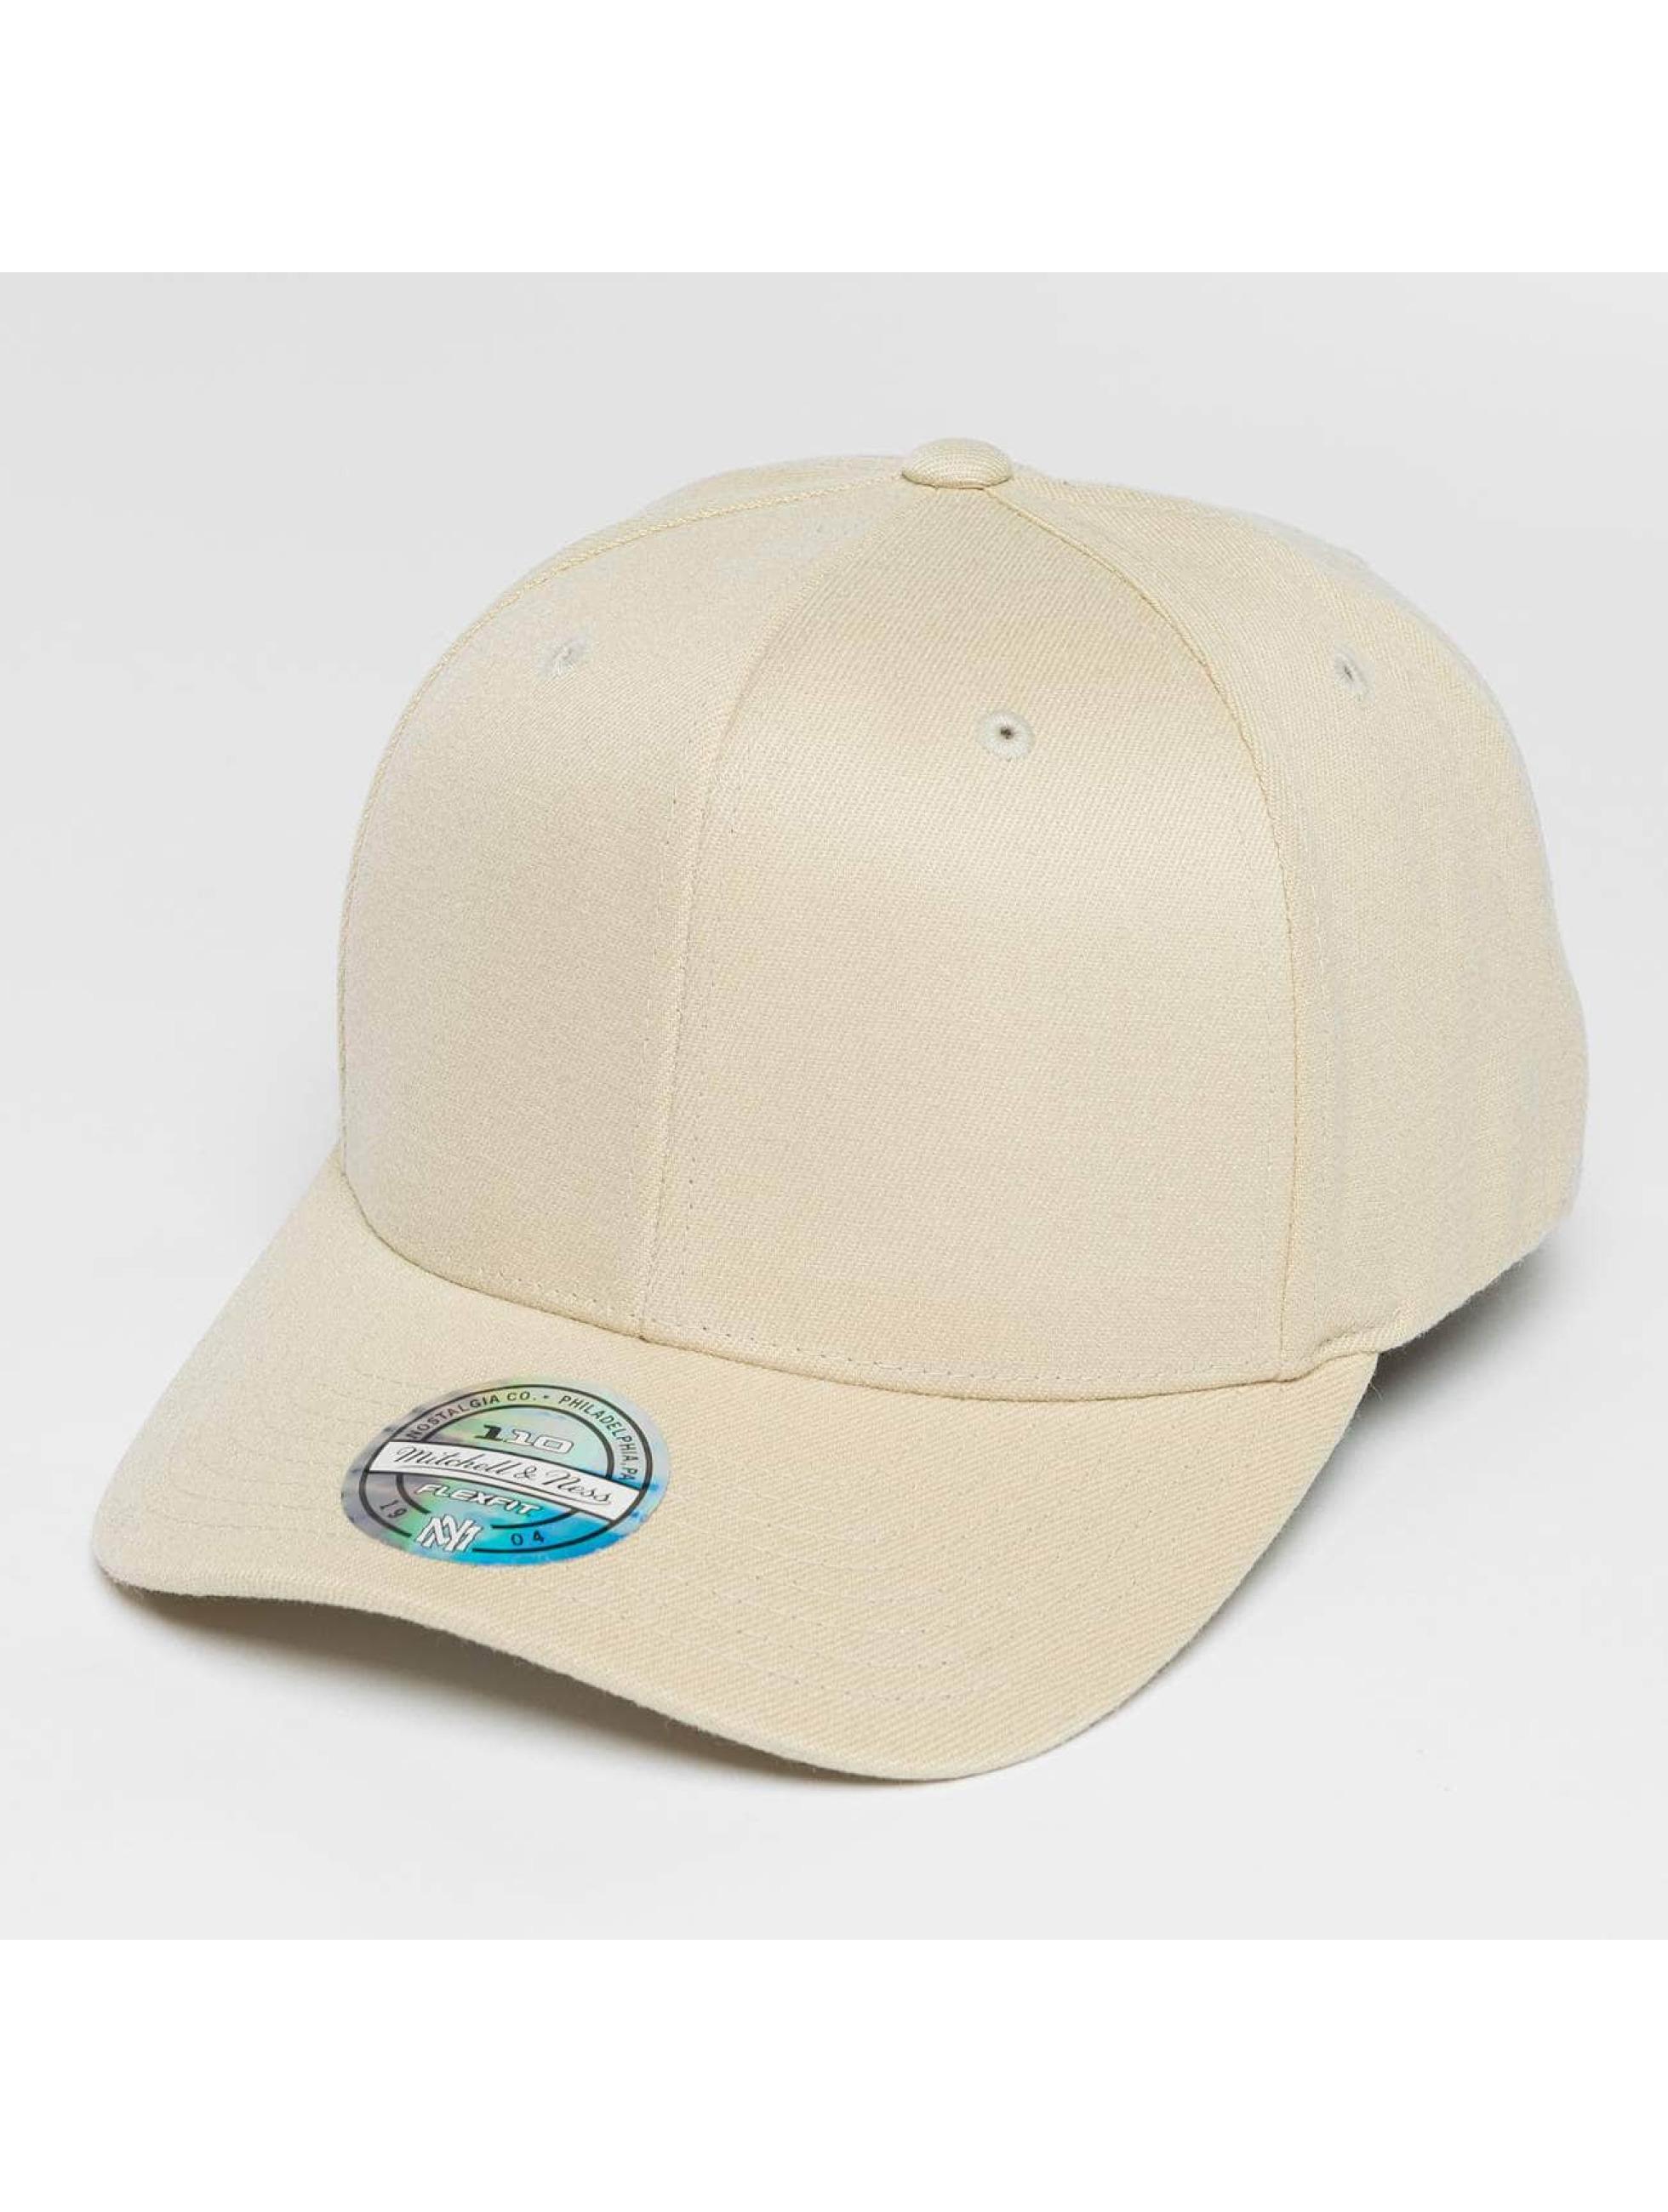 Mitchell & Ness Casquette Snapback & Strapback Blank Flat Peak 110 Curved beige